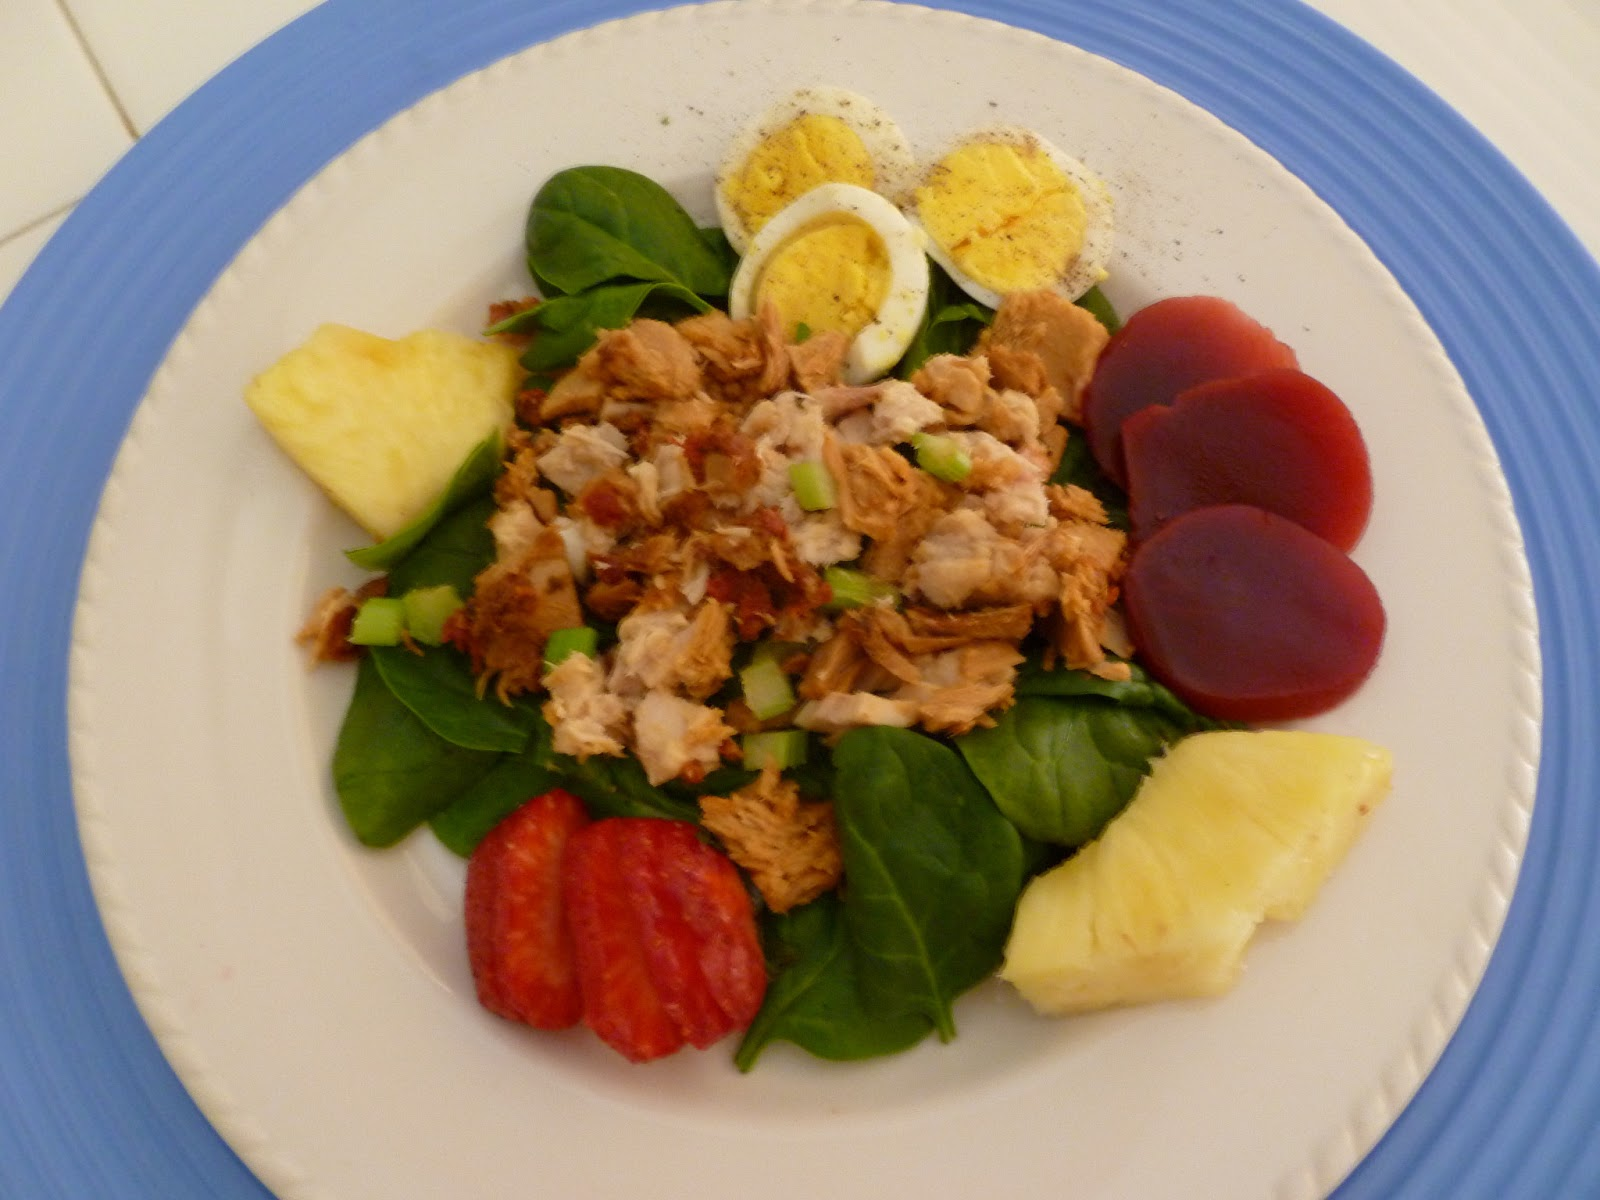 I Like to Bake and Cook!: Love this Salad: Tuna, sun-tried ...